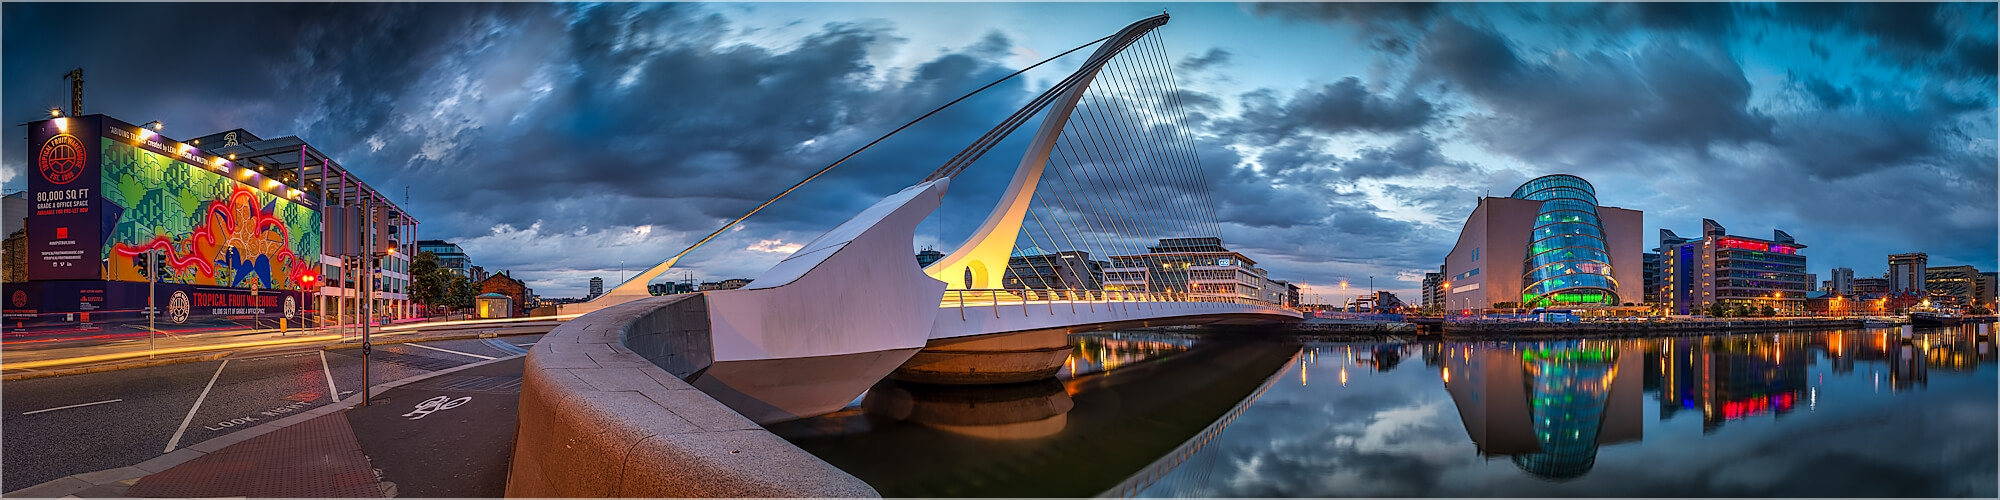 Panoramabild Samuel Beckett Brücke Dublin Irland